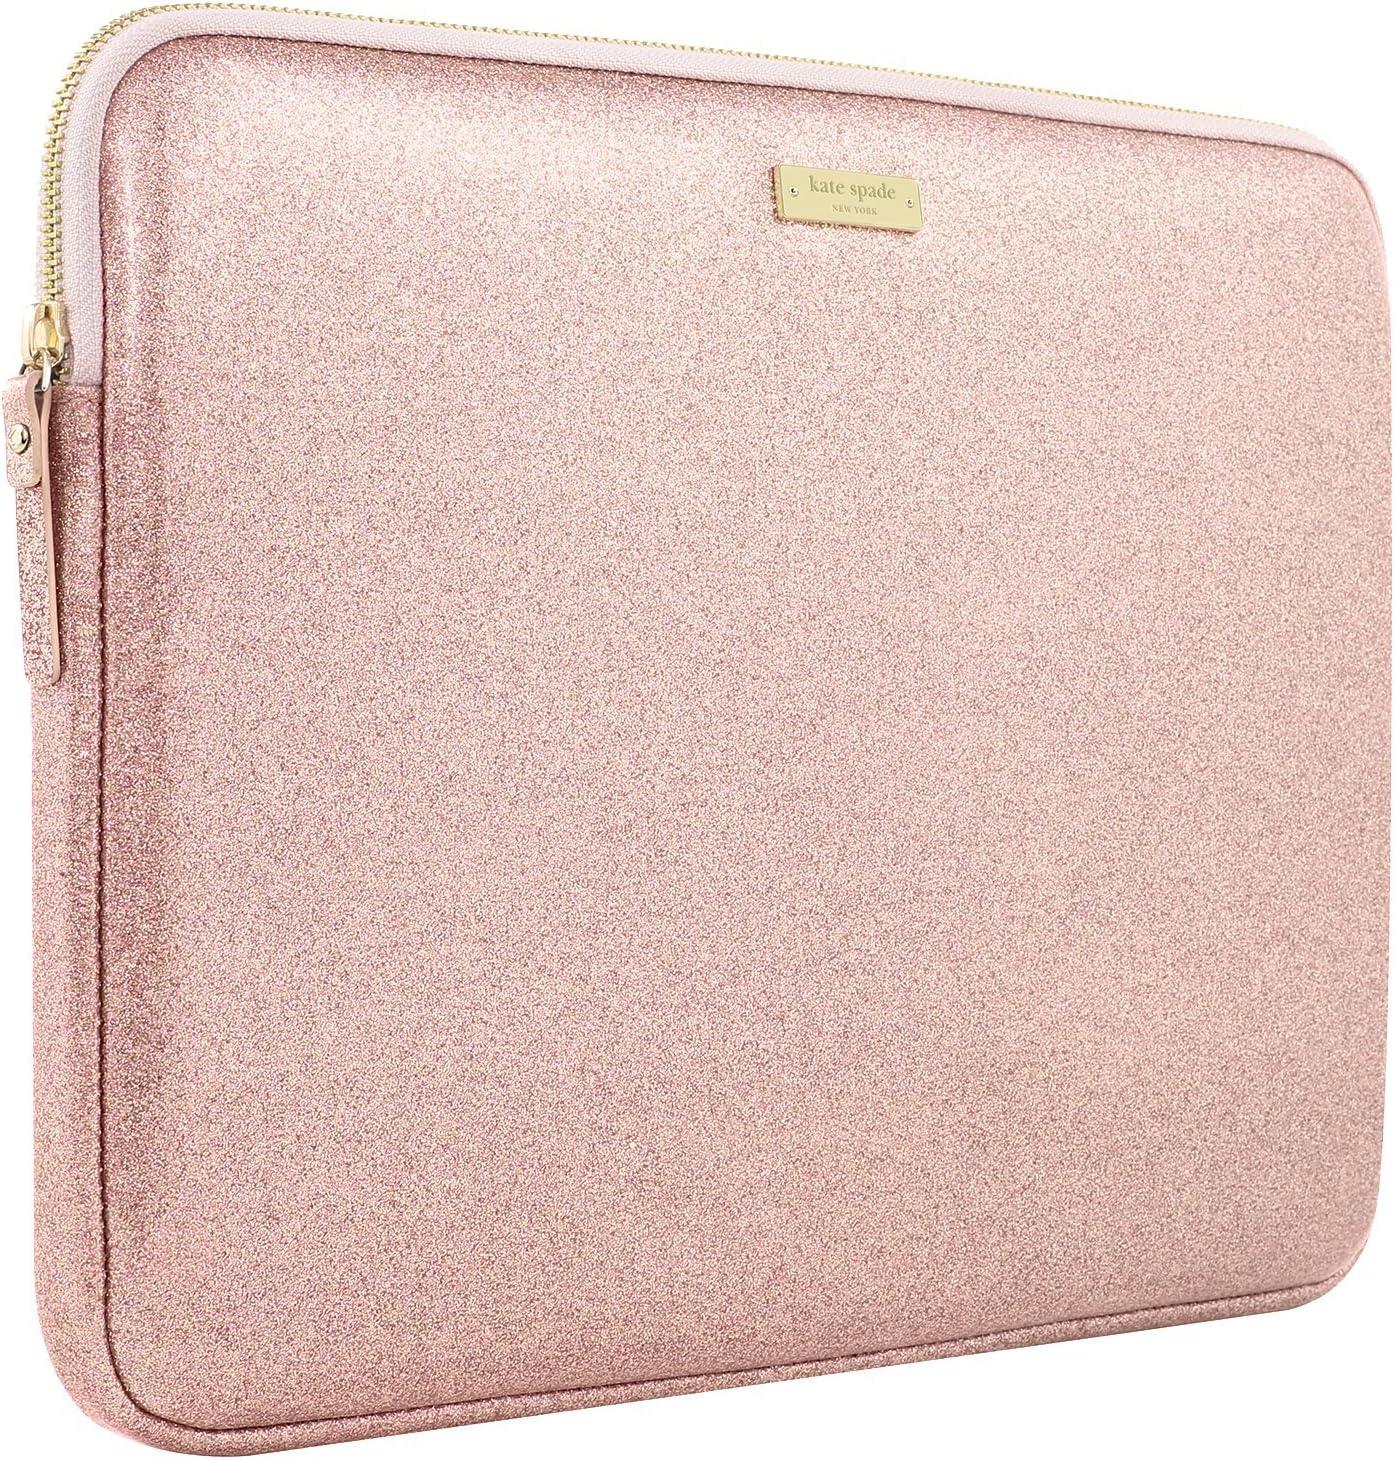 13 Laptop kate spade new york Sleeve for 13 MacBook Rose Gold Glitter